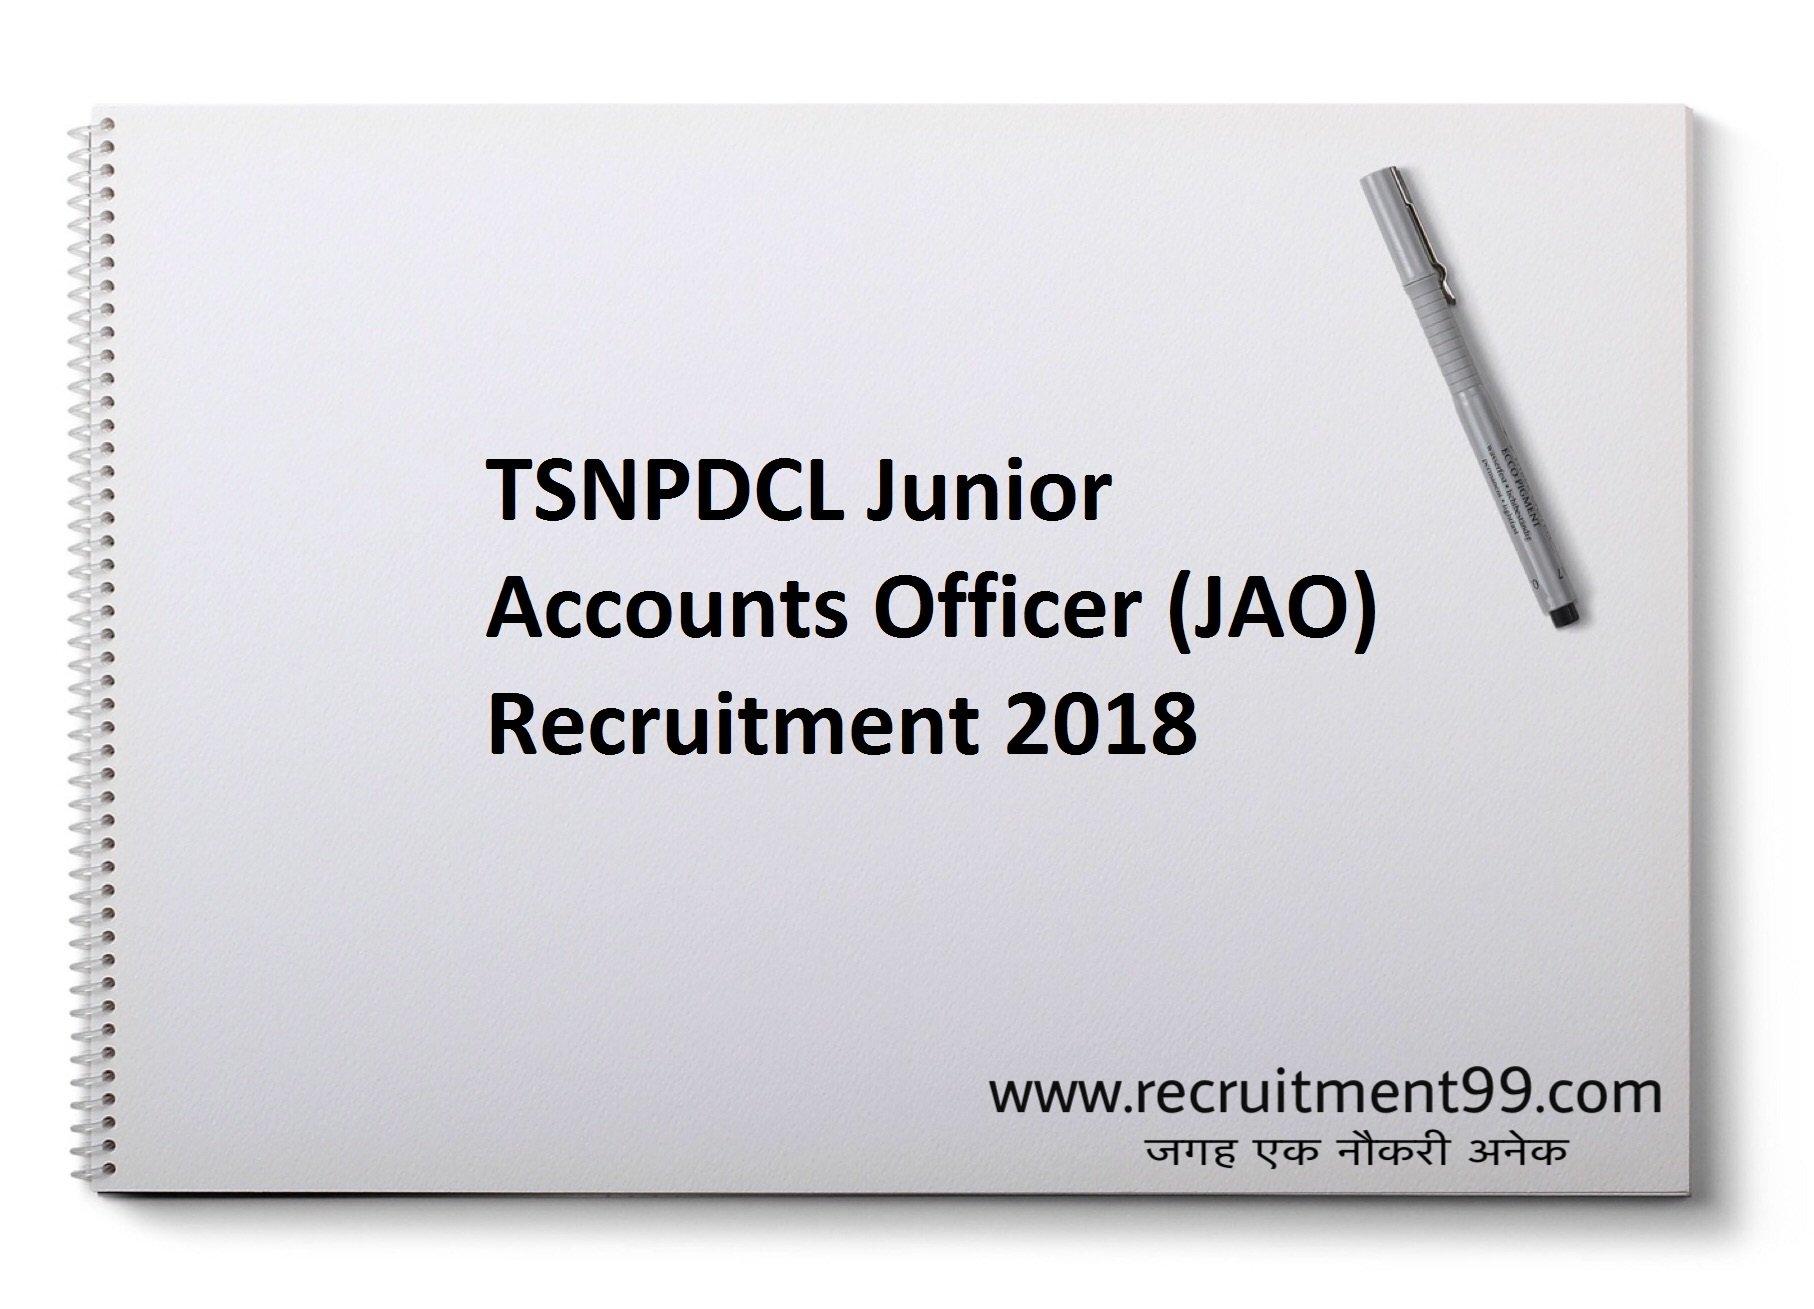 TSNPDCL Junior Accounts Officer JAO Recruitment Admit Card Result 2018